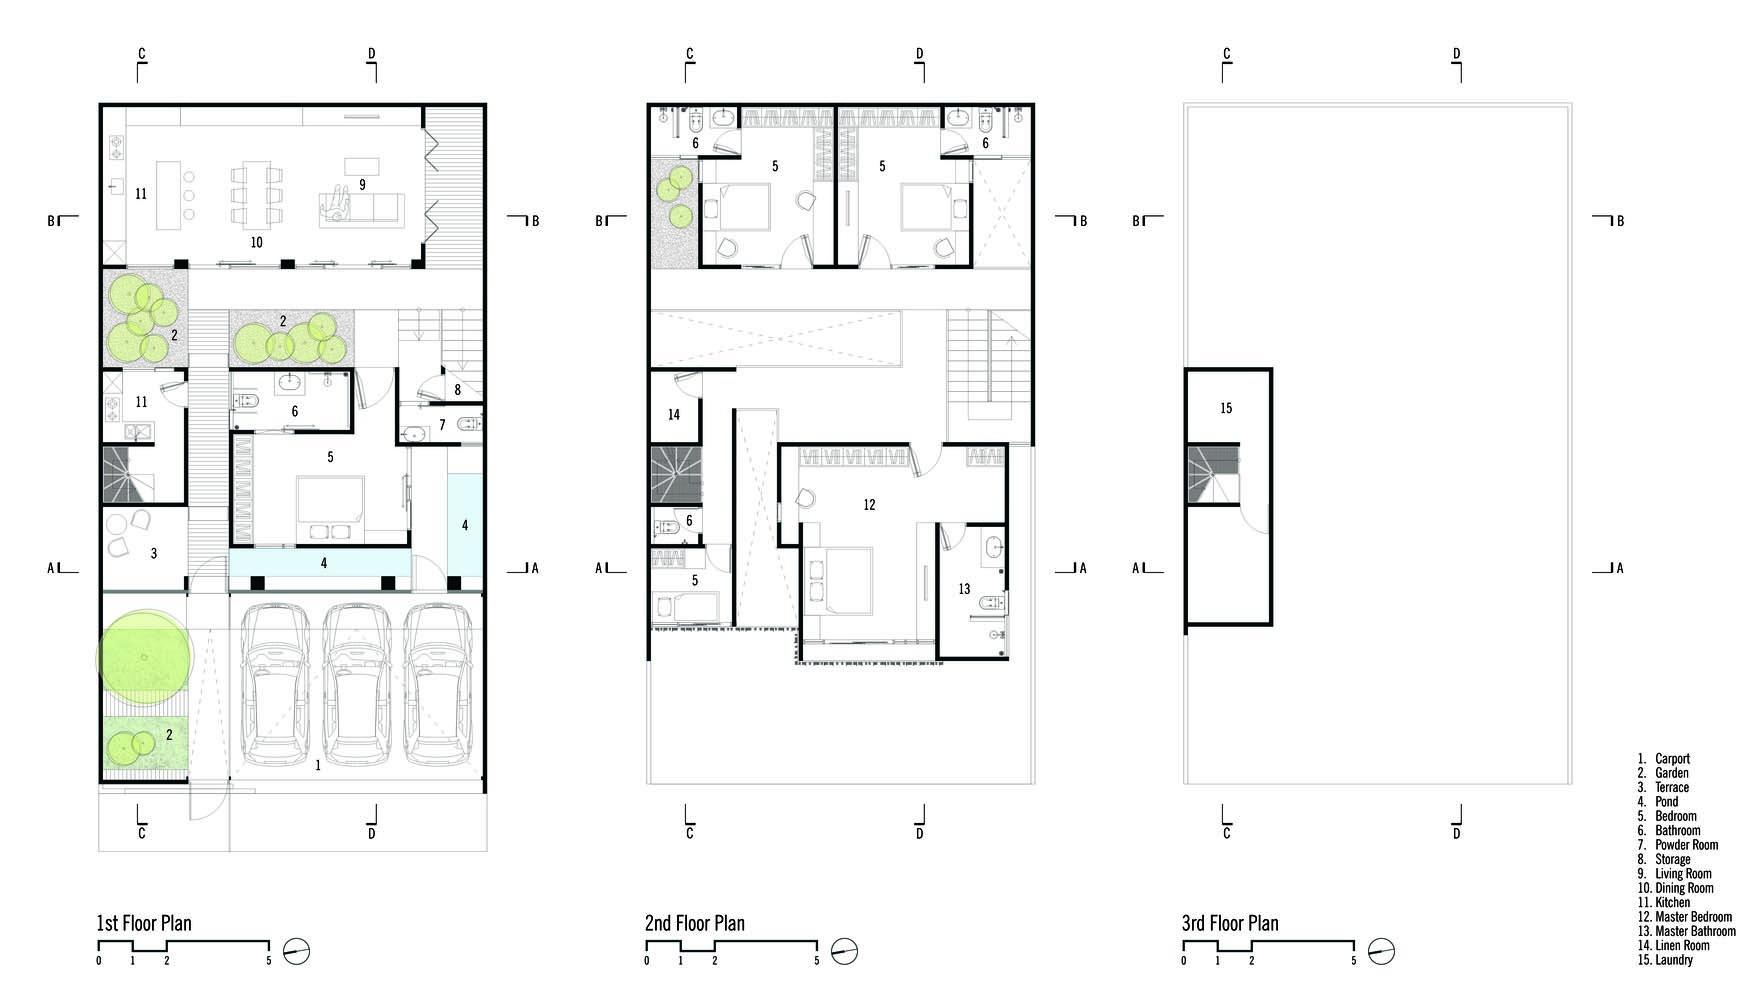 Denah Rumah Beton karya Parisauli Arsitek (Sumber: archdaily.com)